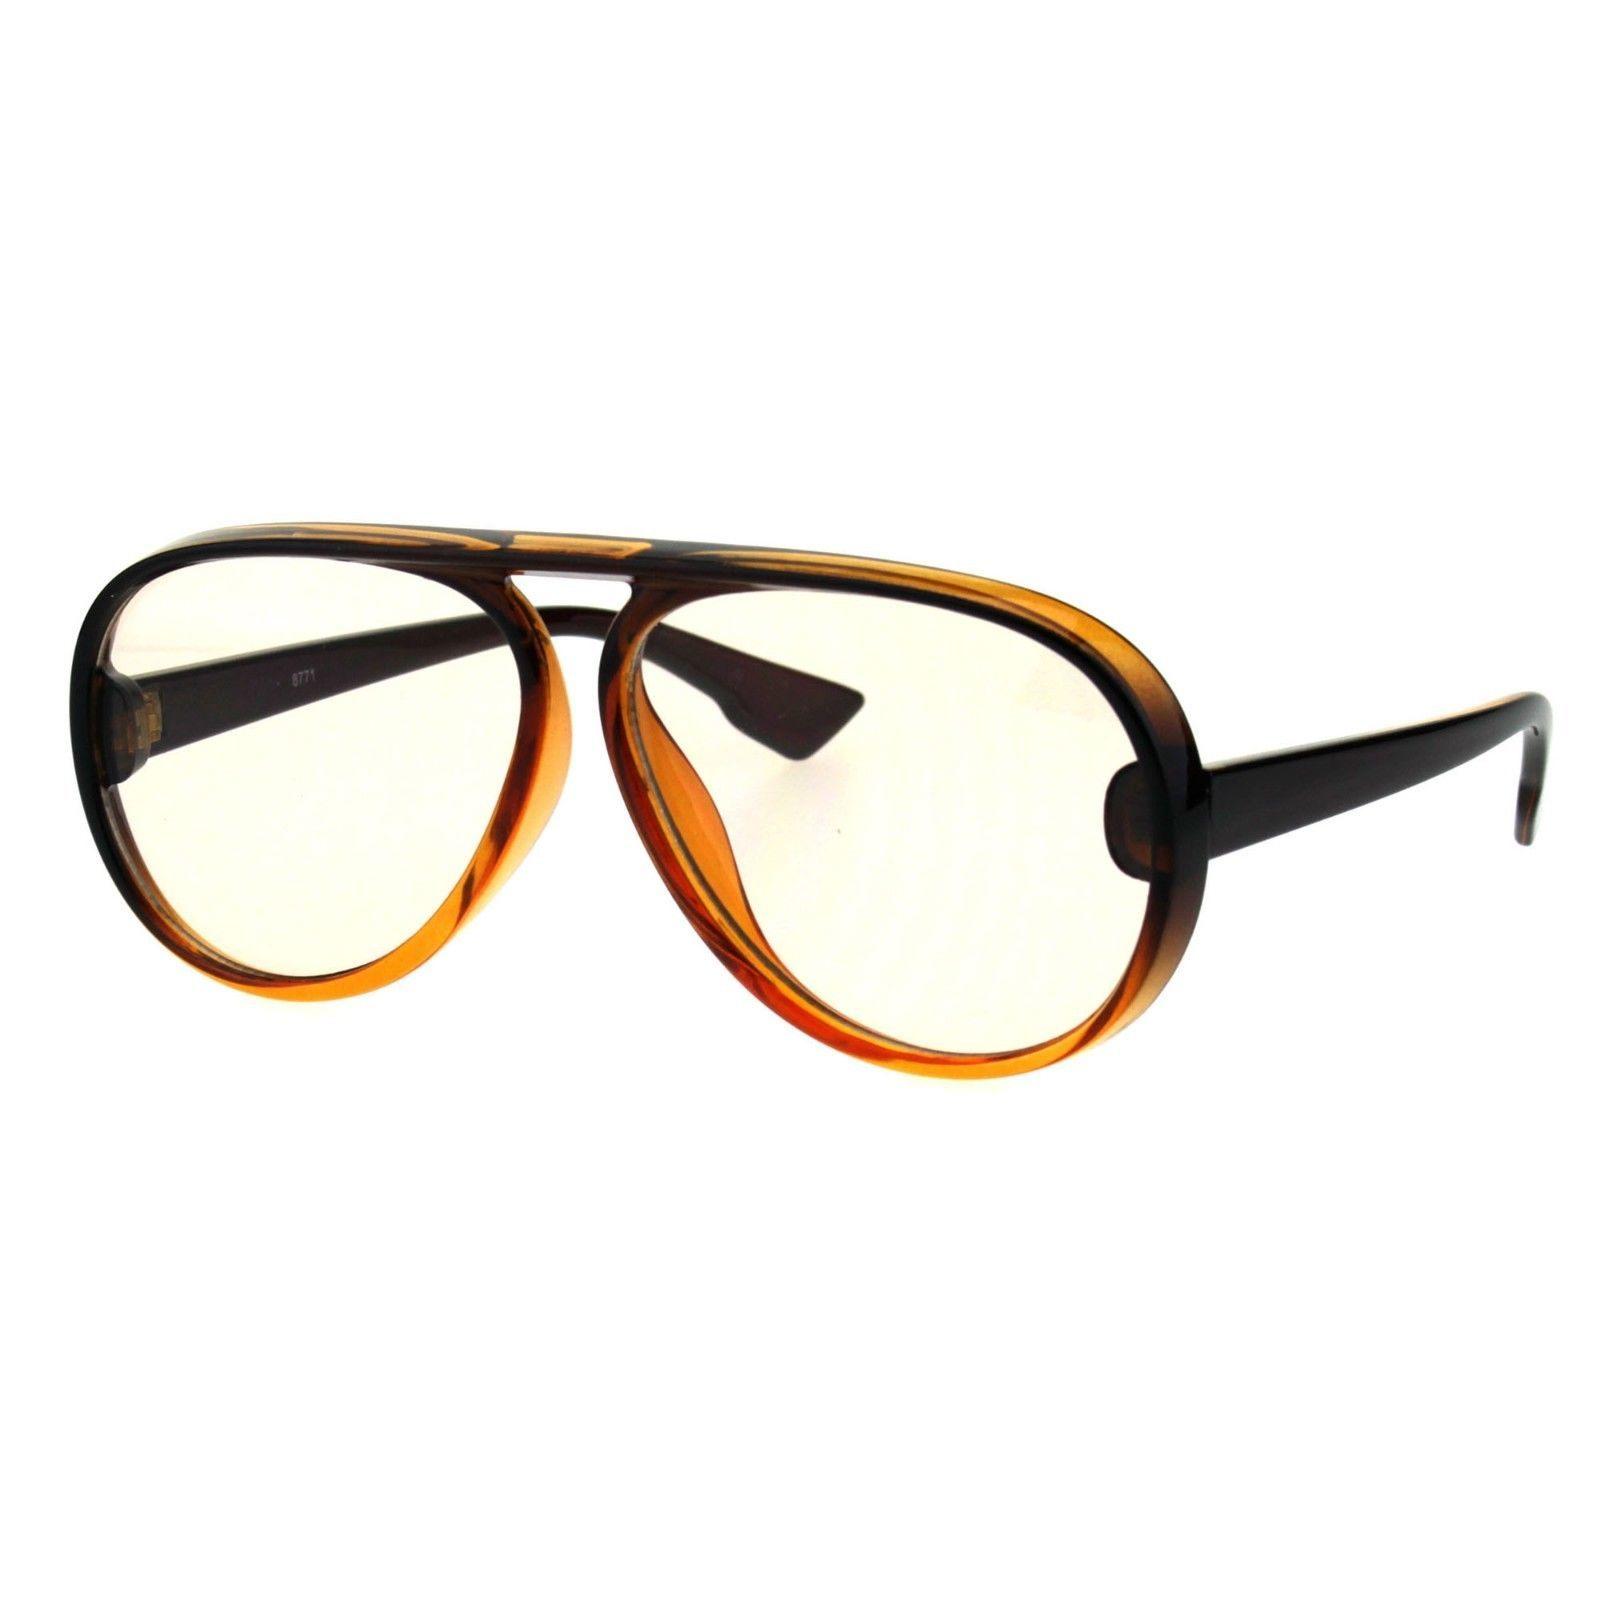 Vintage Retro Fashion Sunglasses Unisex Round Racer Aviator UV 400